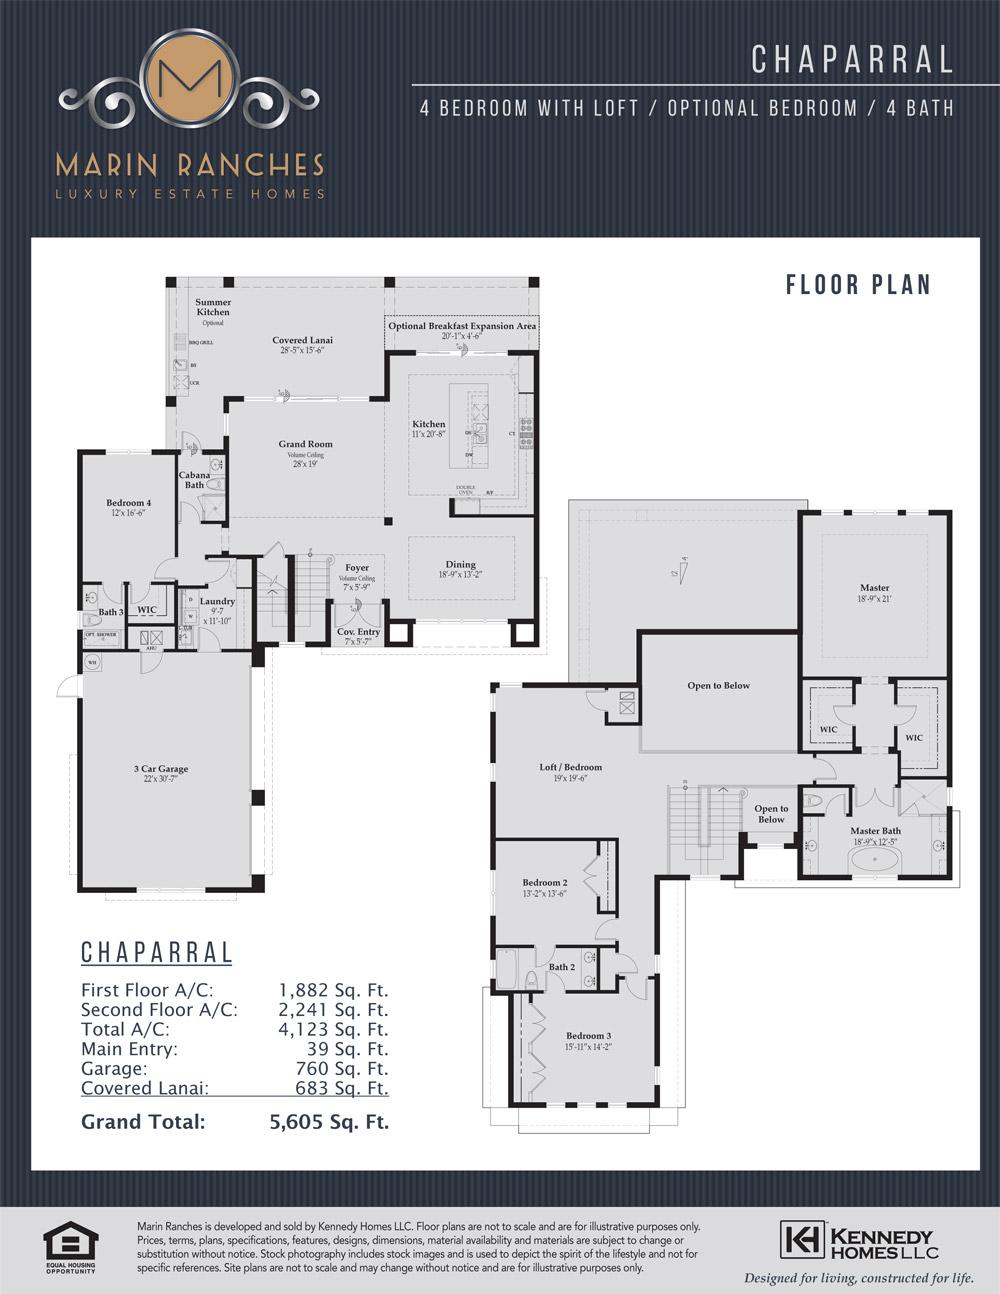 Chaparral Floorplan Velez Real Estate Group